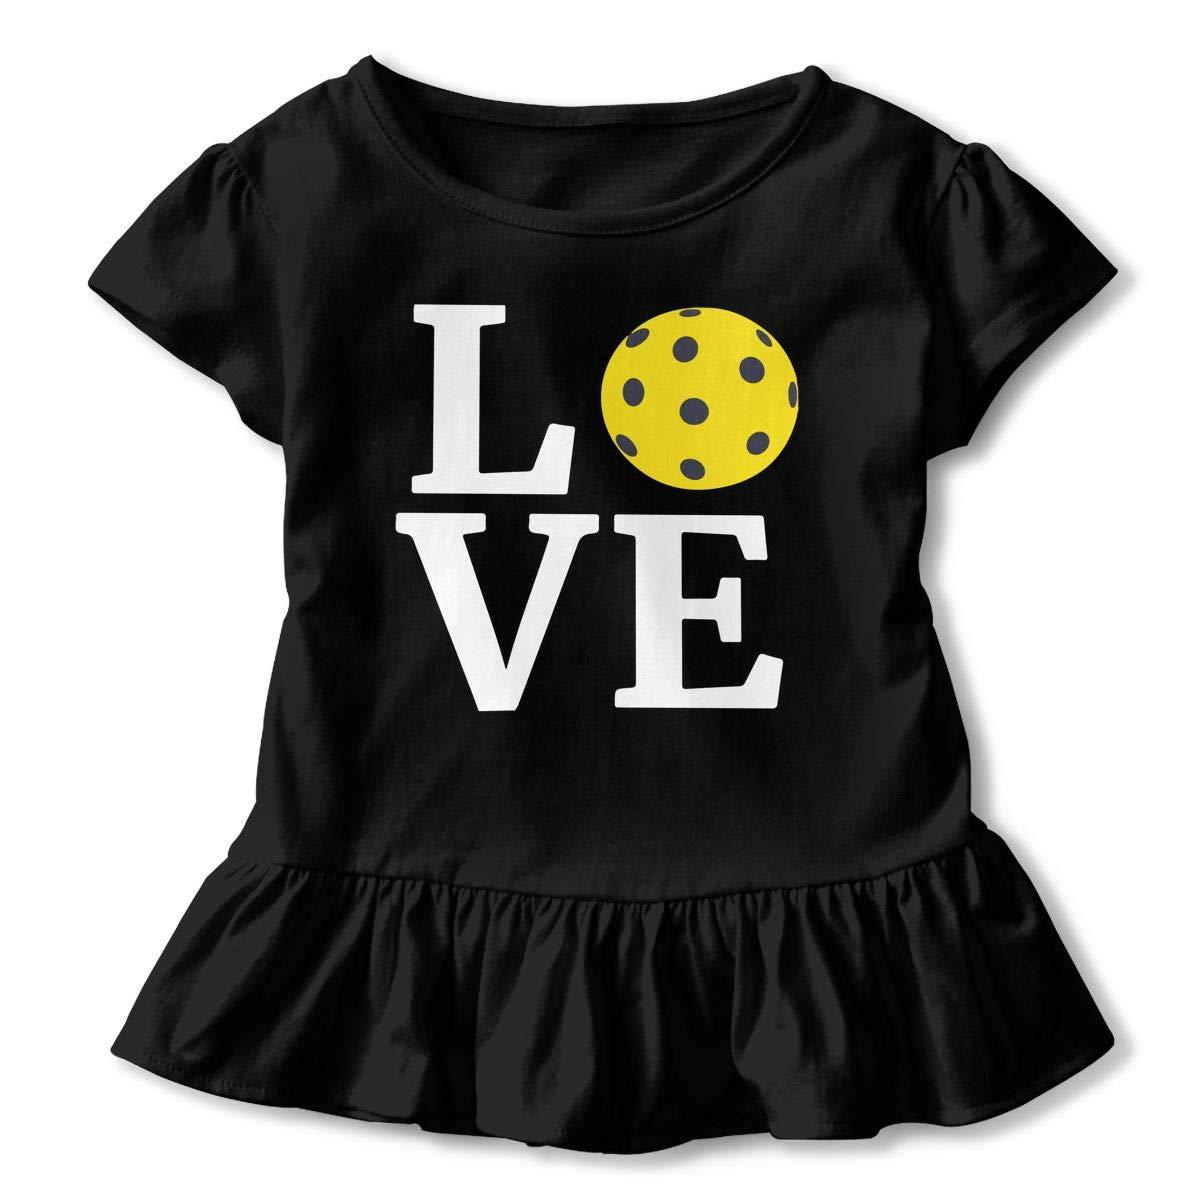 Love Pickleball T-Shirts Toddler//Infant Girls Short Sleeve Ruffles Shirt T-Shirt for 2-6T